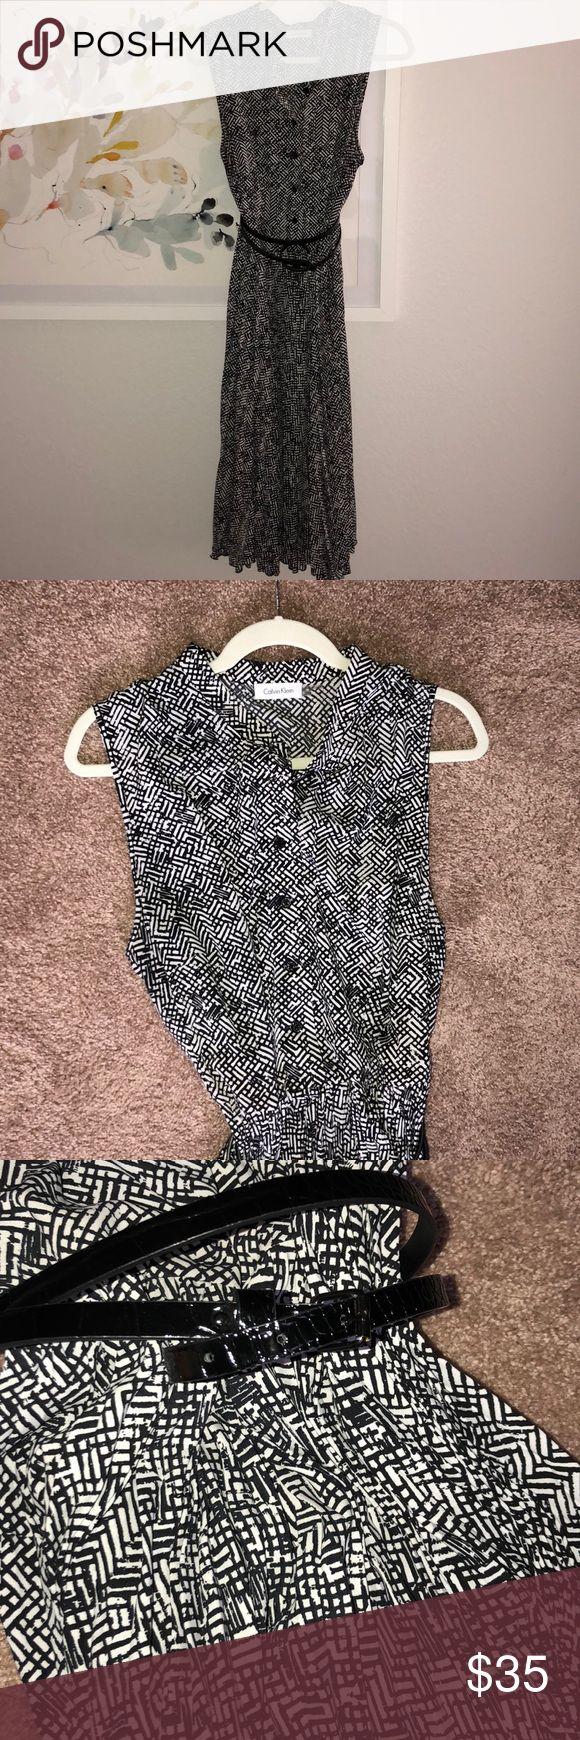 Calvin Klein Dress Sleeve less pleated skirt dress from Calvin Klein. Belt is embossed croc and included. Calvin Klein Dresses Midi